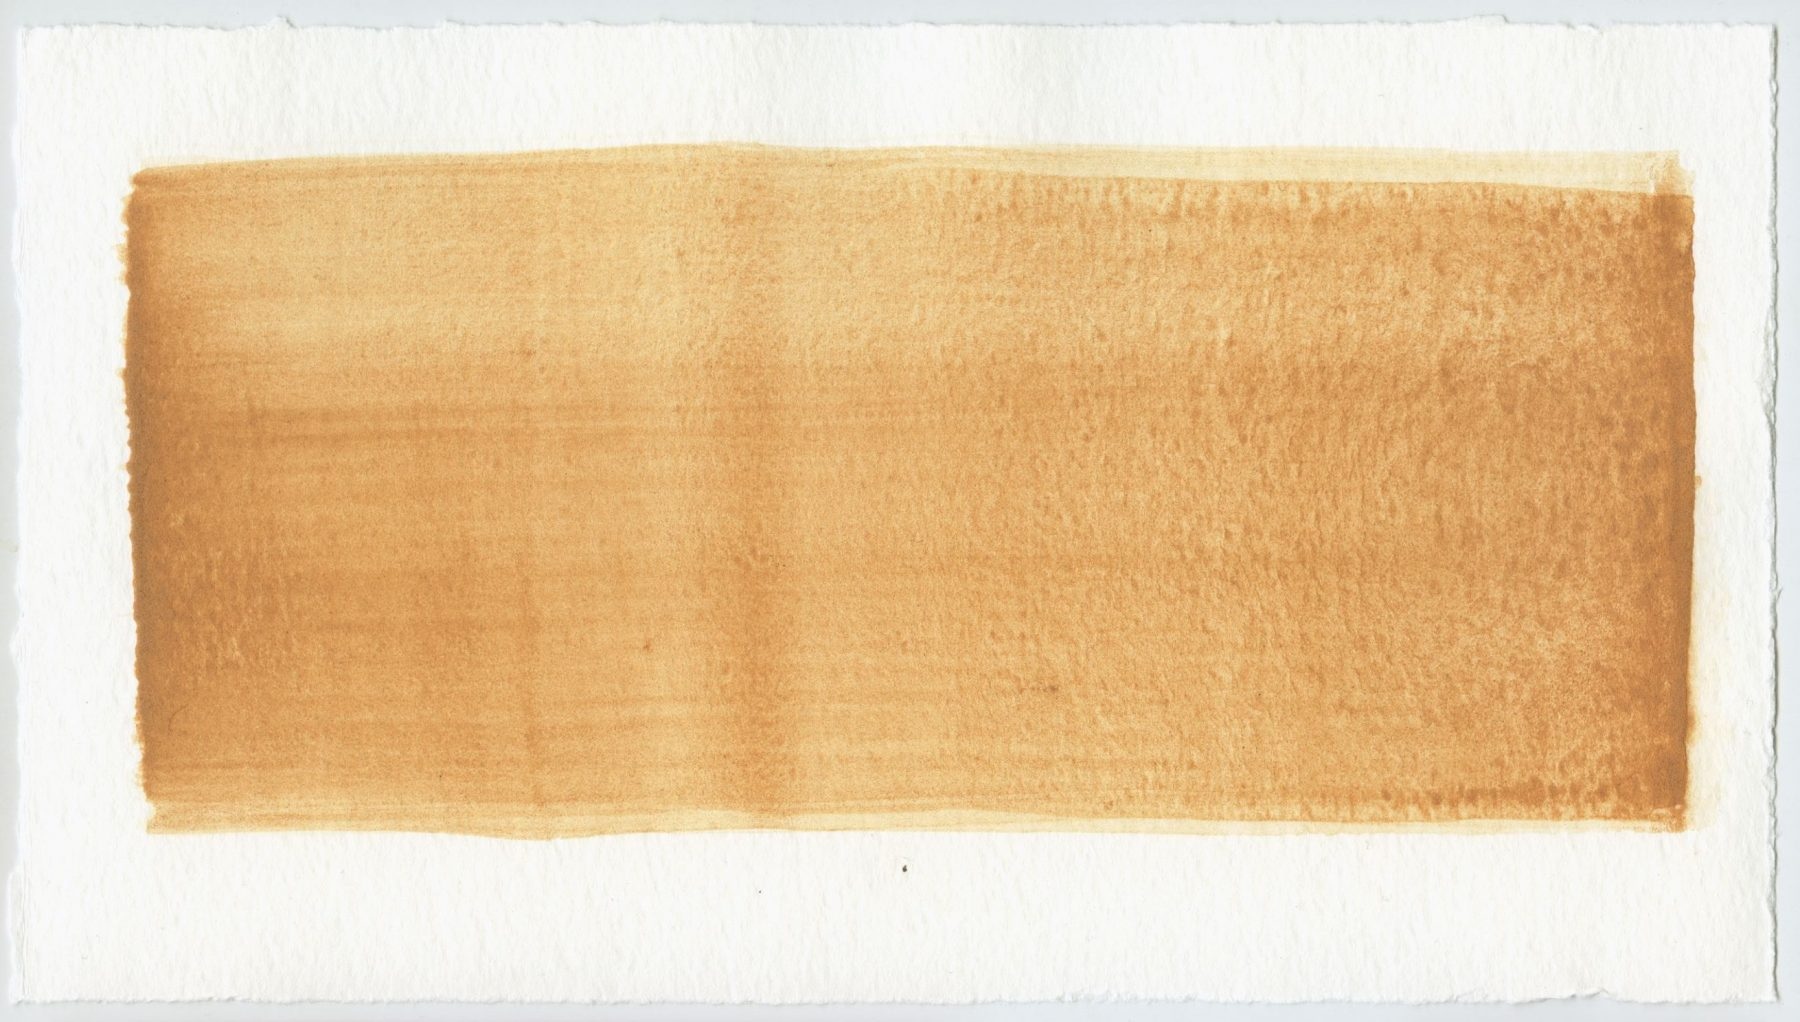 No. 12 PEREKKER ROZE - clay [burnt no. 11, 1020°C] - 04 December 2018 51° 35.838'N 5° 41.080'E